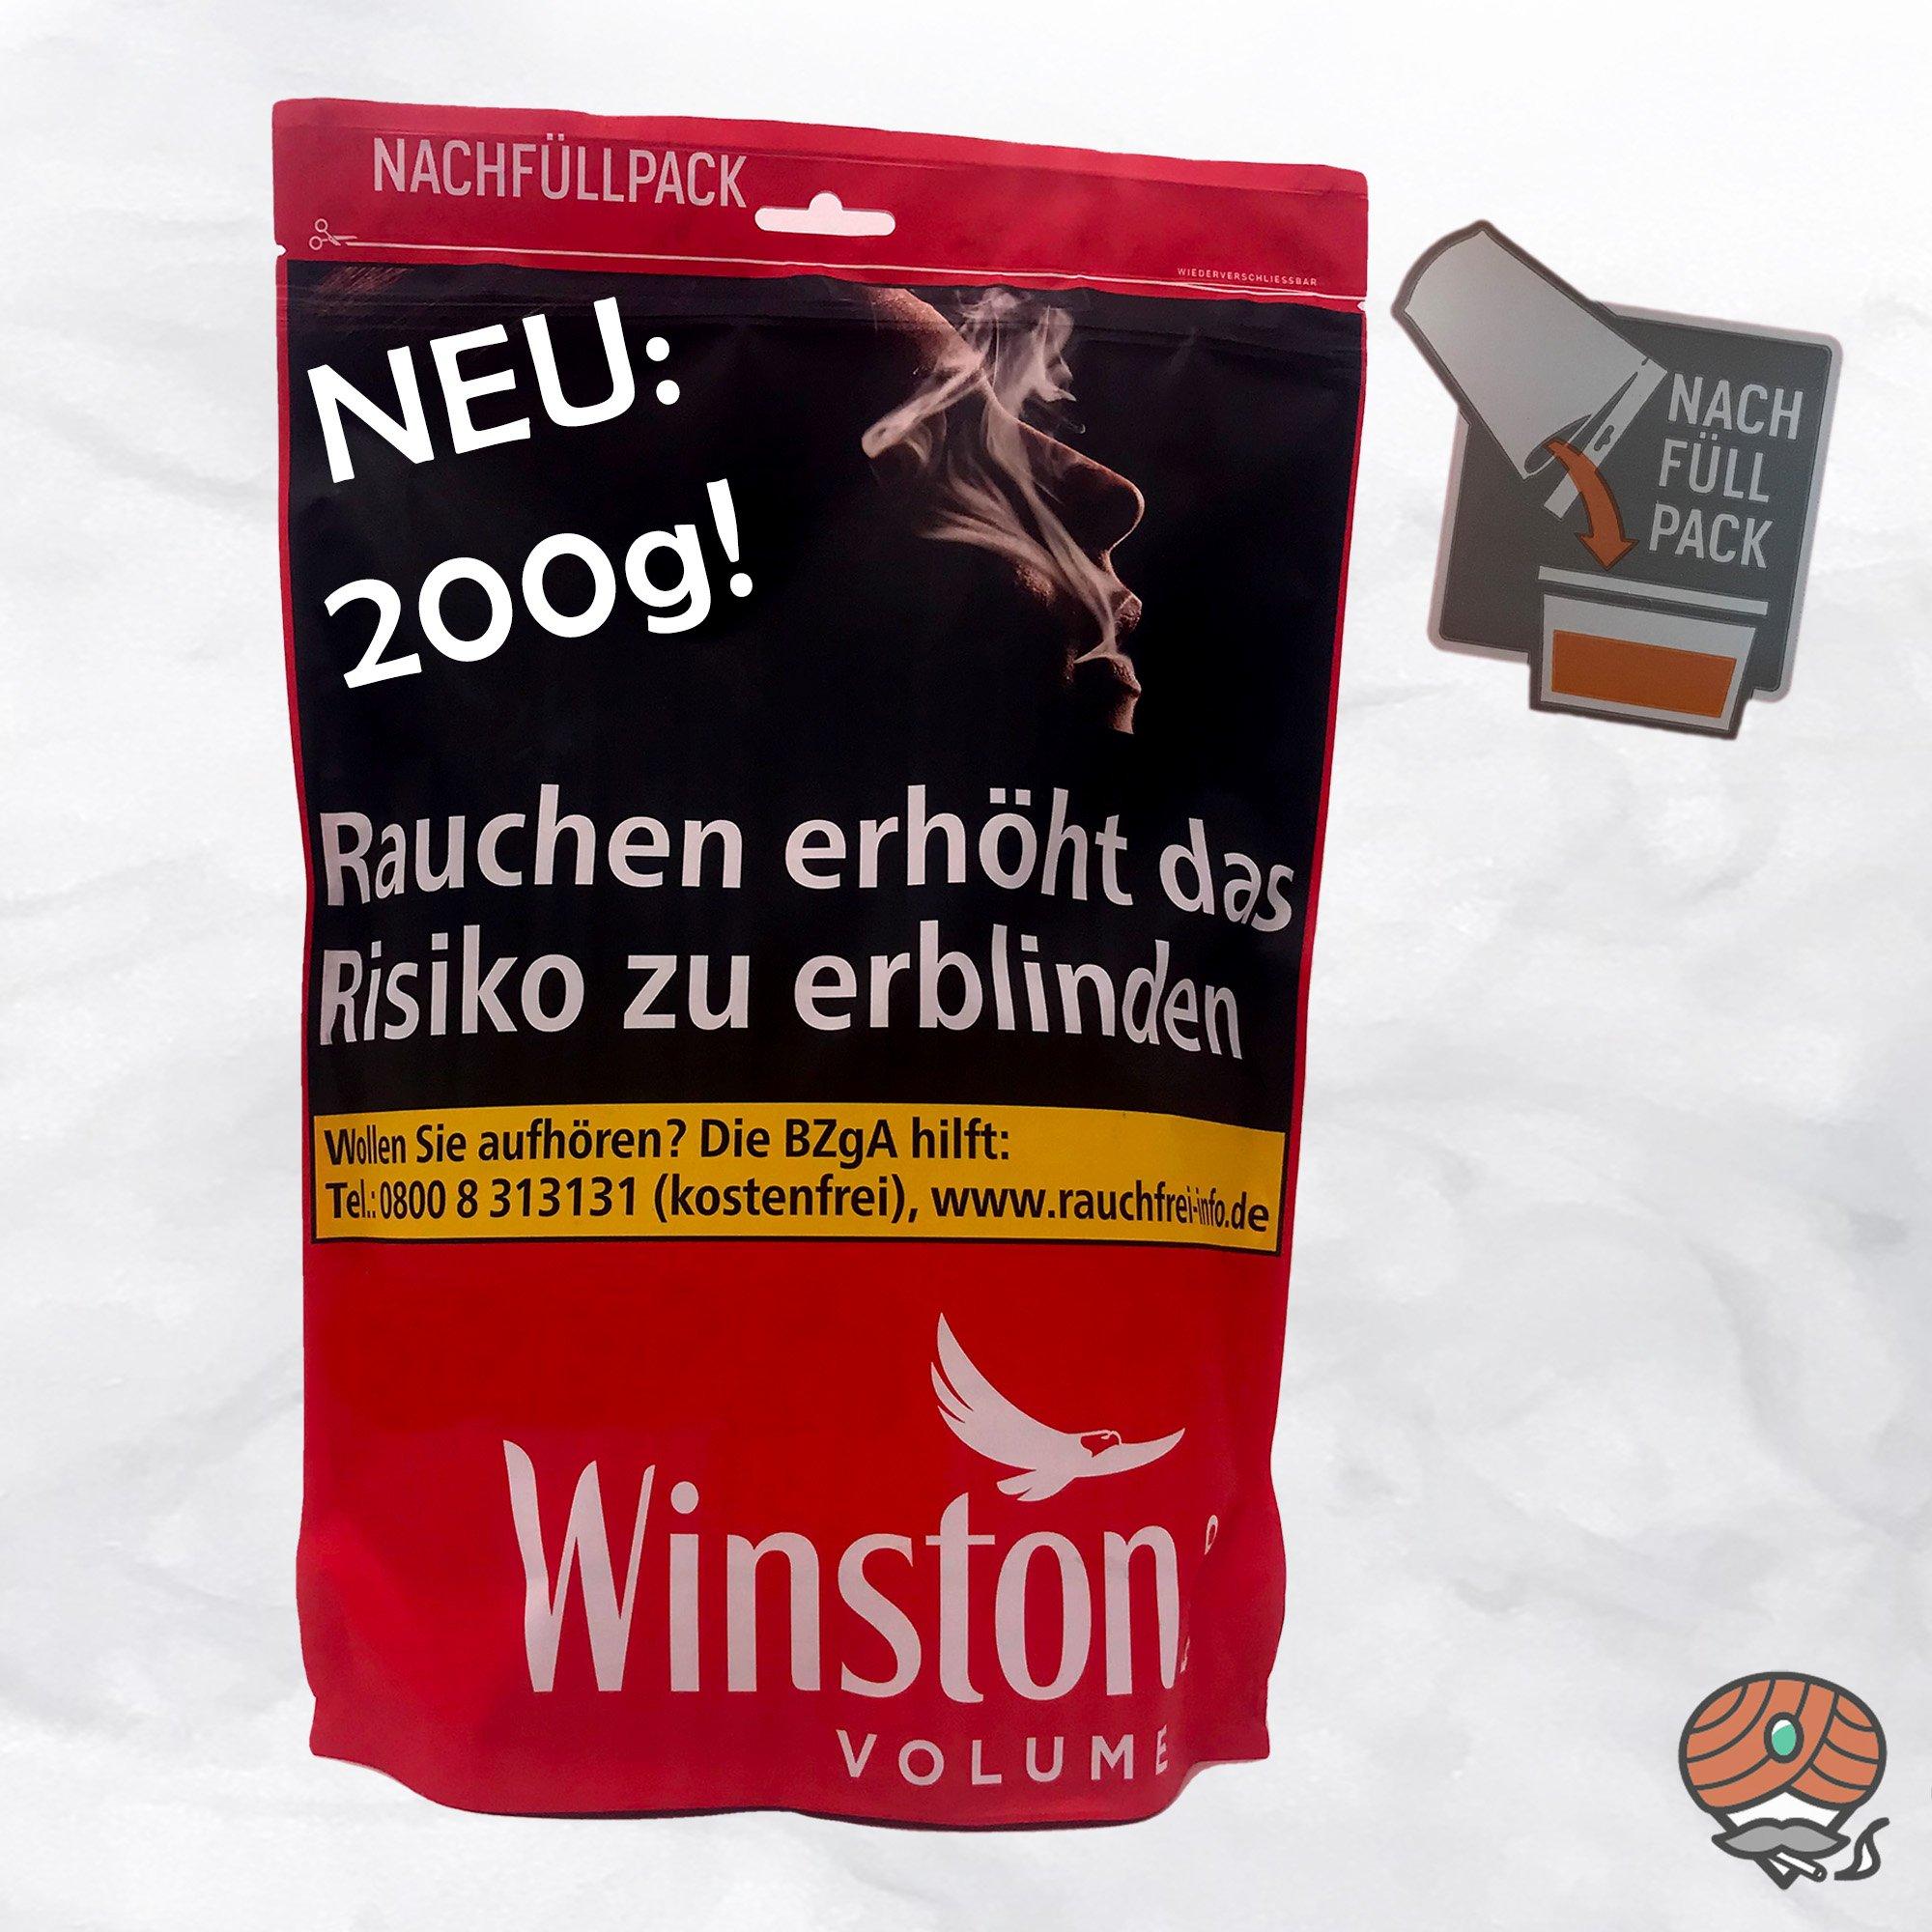 Winston Volume Red / Rot Tabak Nachfüllpack 200g Beutel